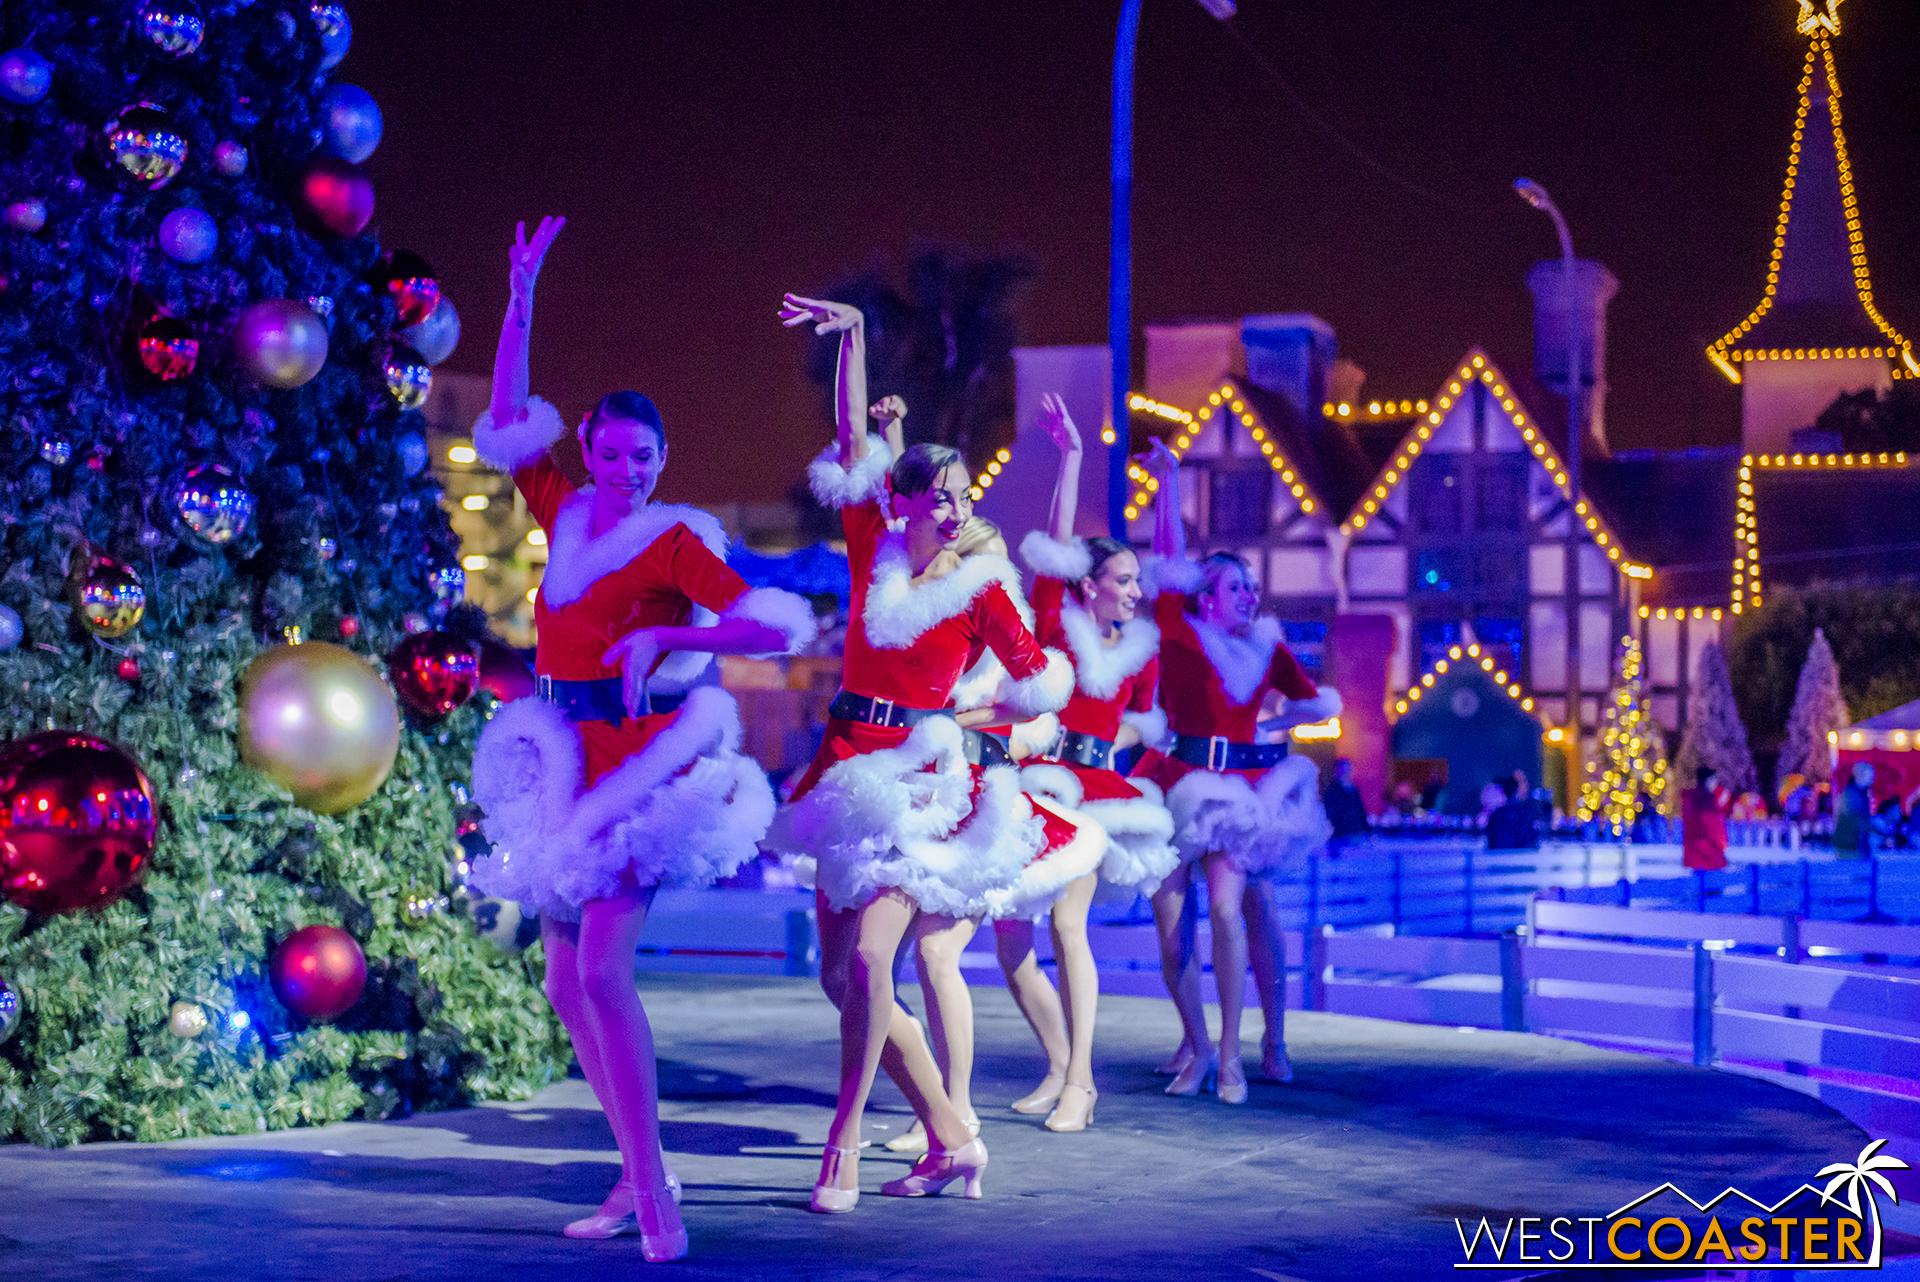 They celebrate the jingle holiday season.